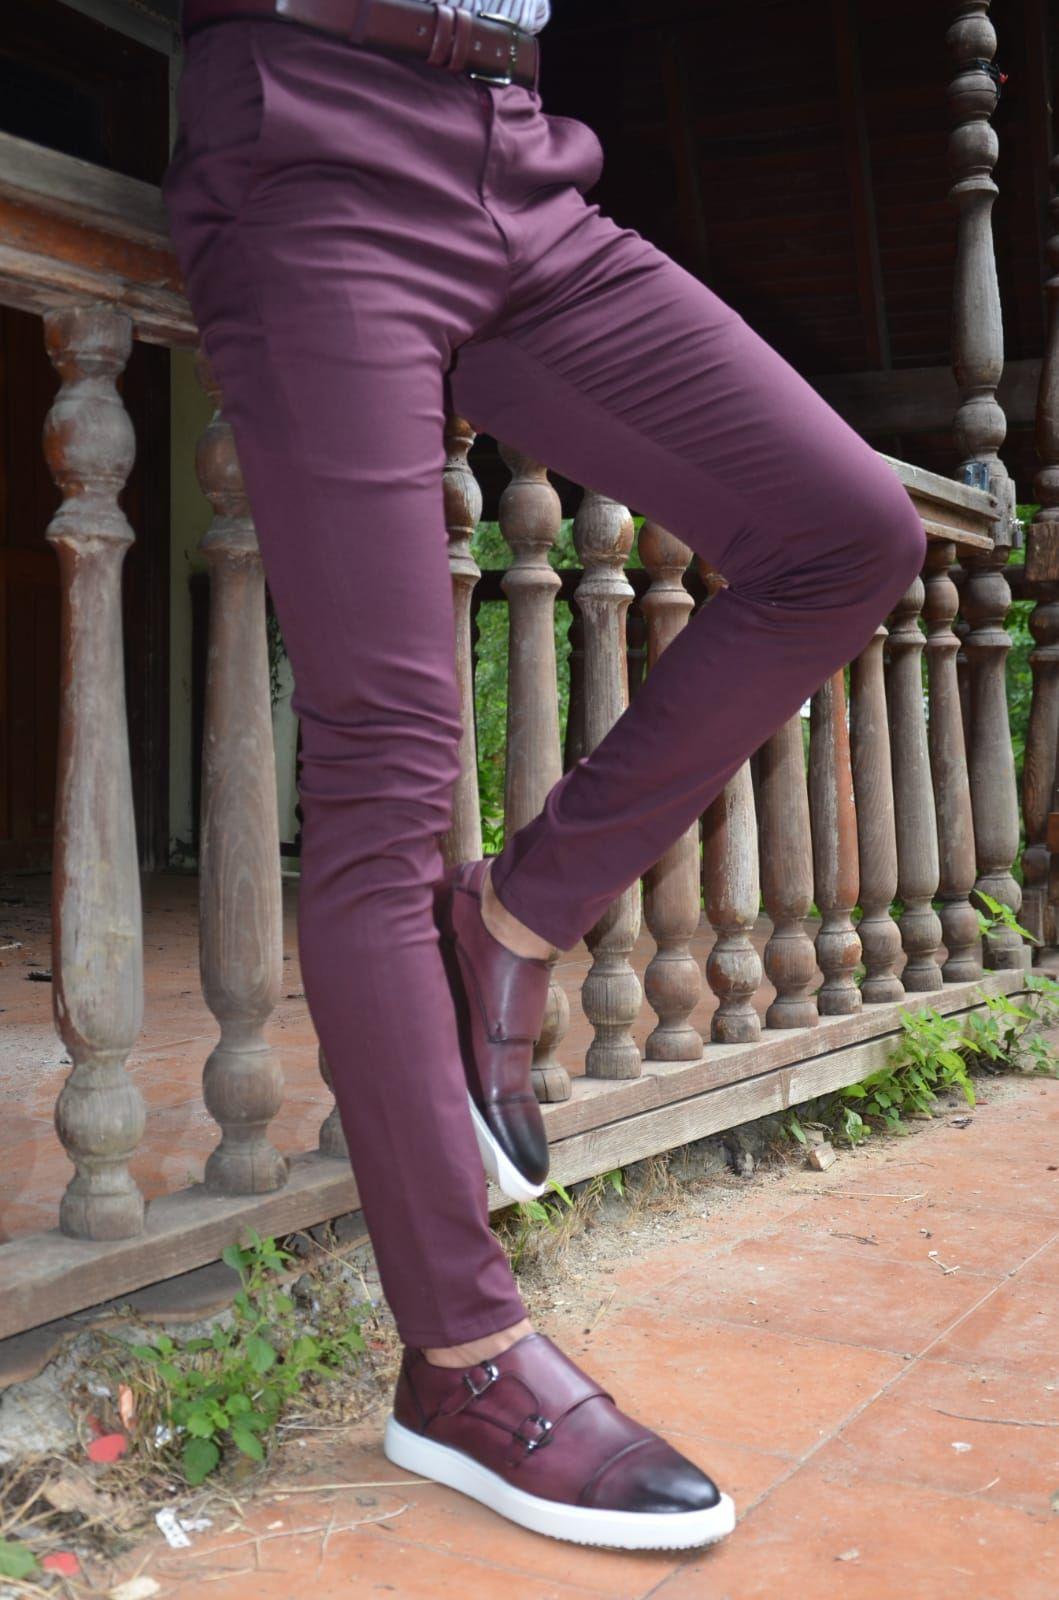 Buy Burgundy Slim Fit Pants By Gentwith With Free Shipping Slim Fit Cotton Pants Slim Fit Pants Slim Fit Pants Men